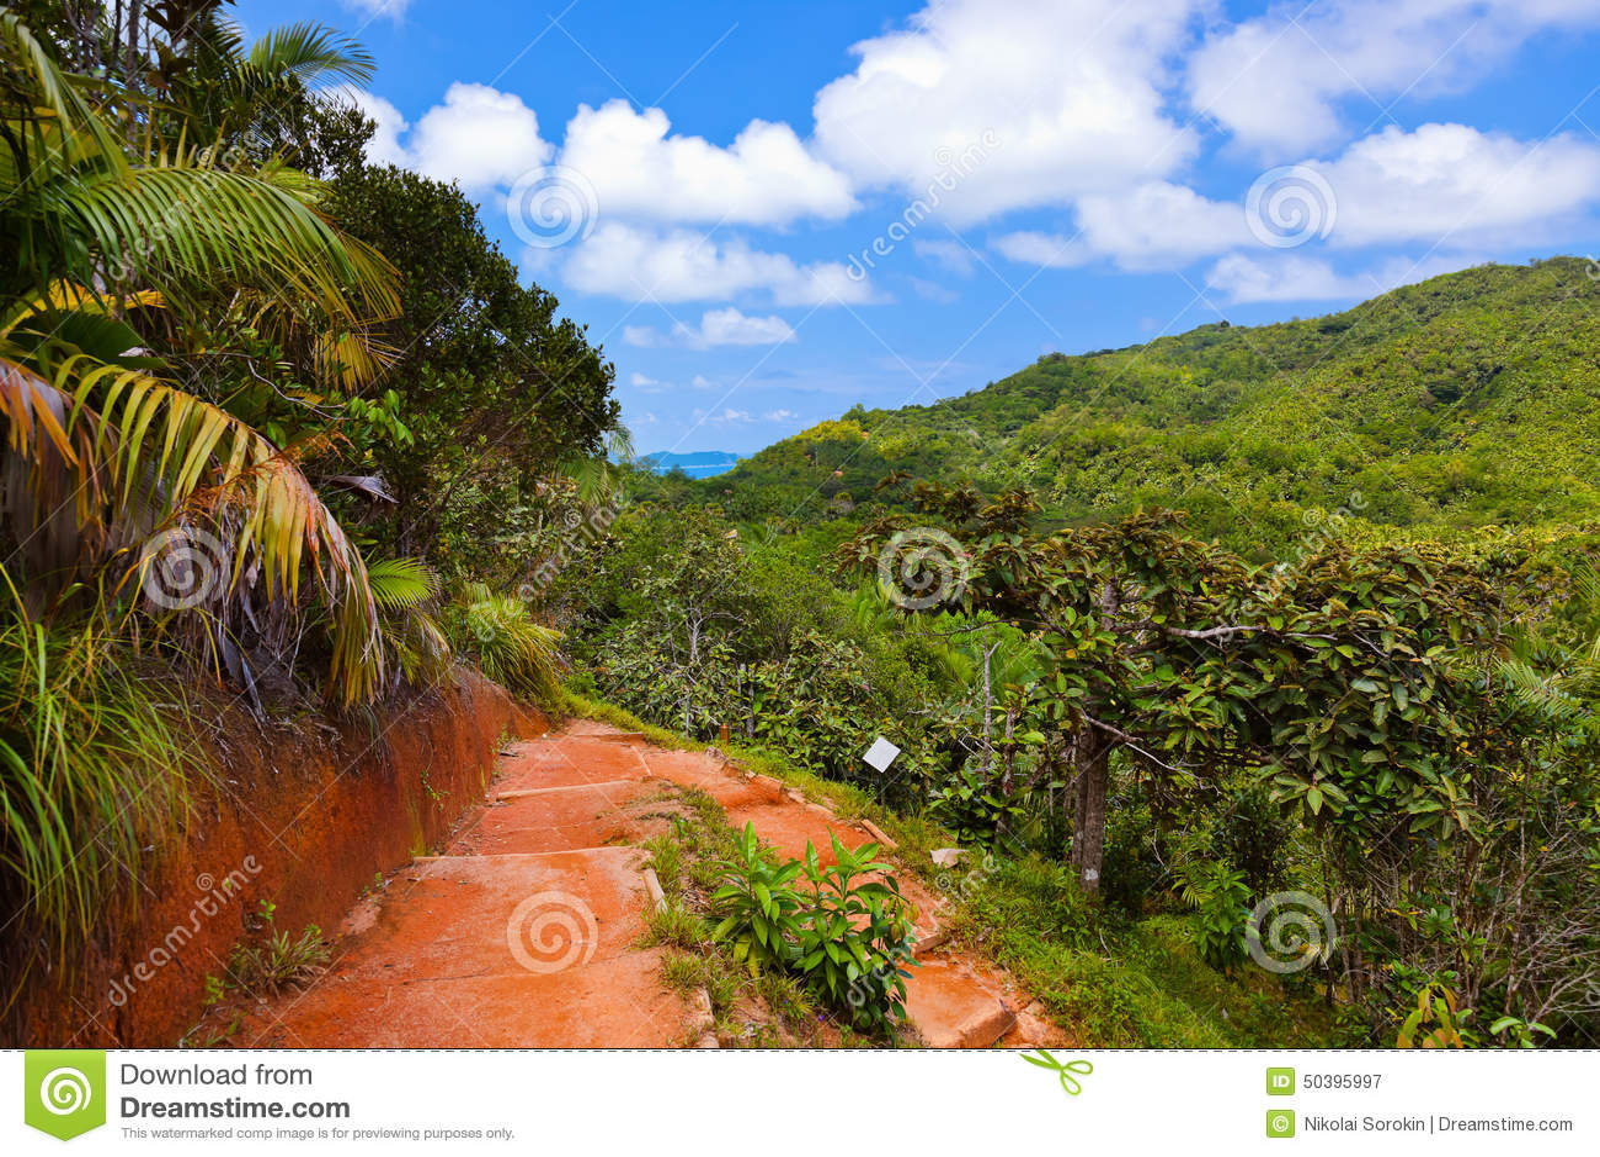 Via in giungla - Vallee de Mai - Seychelles